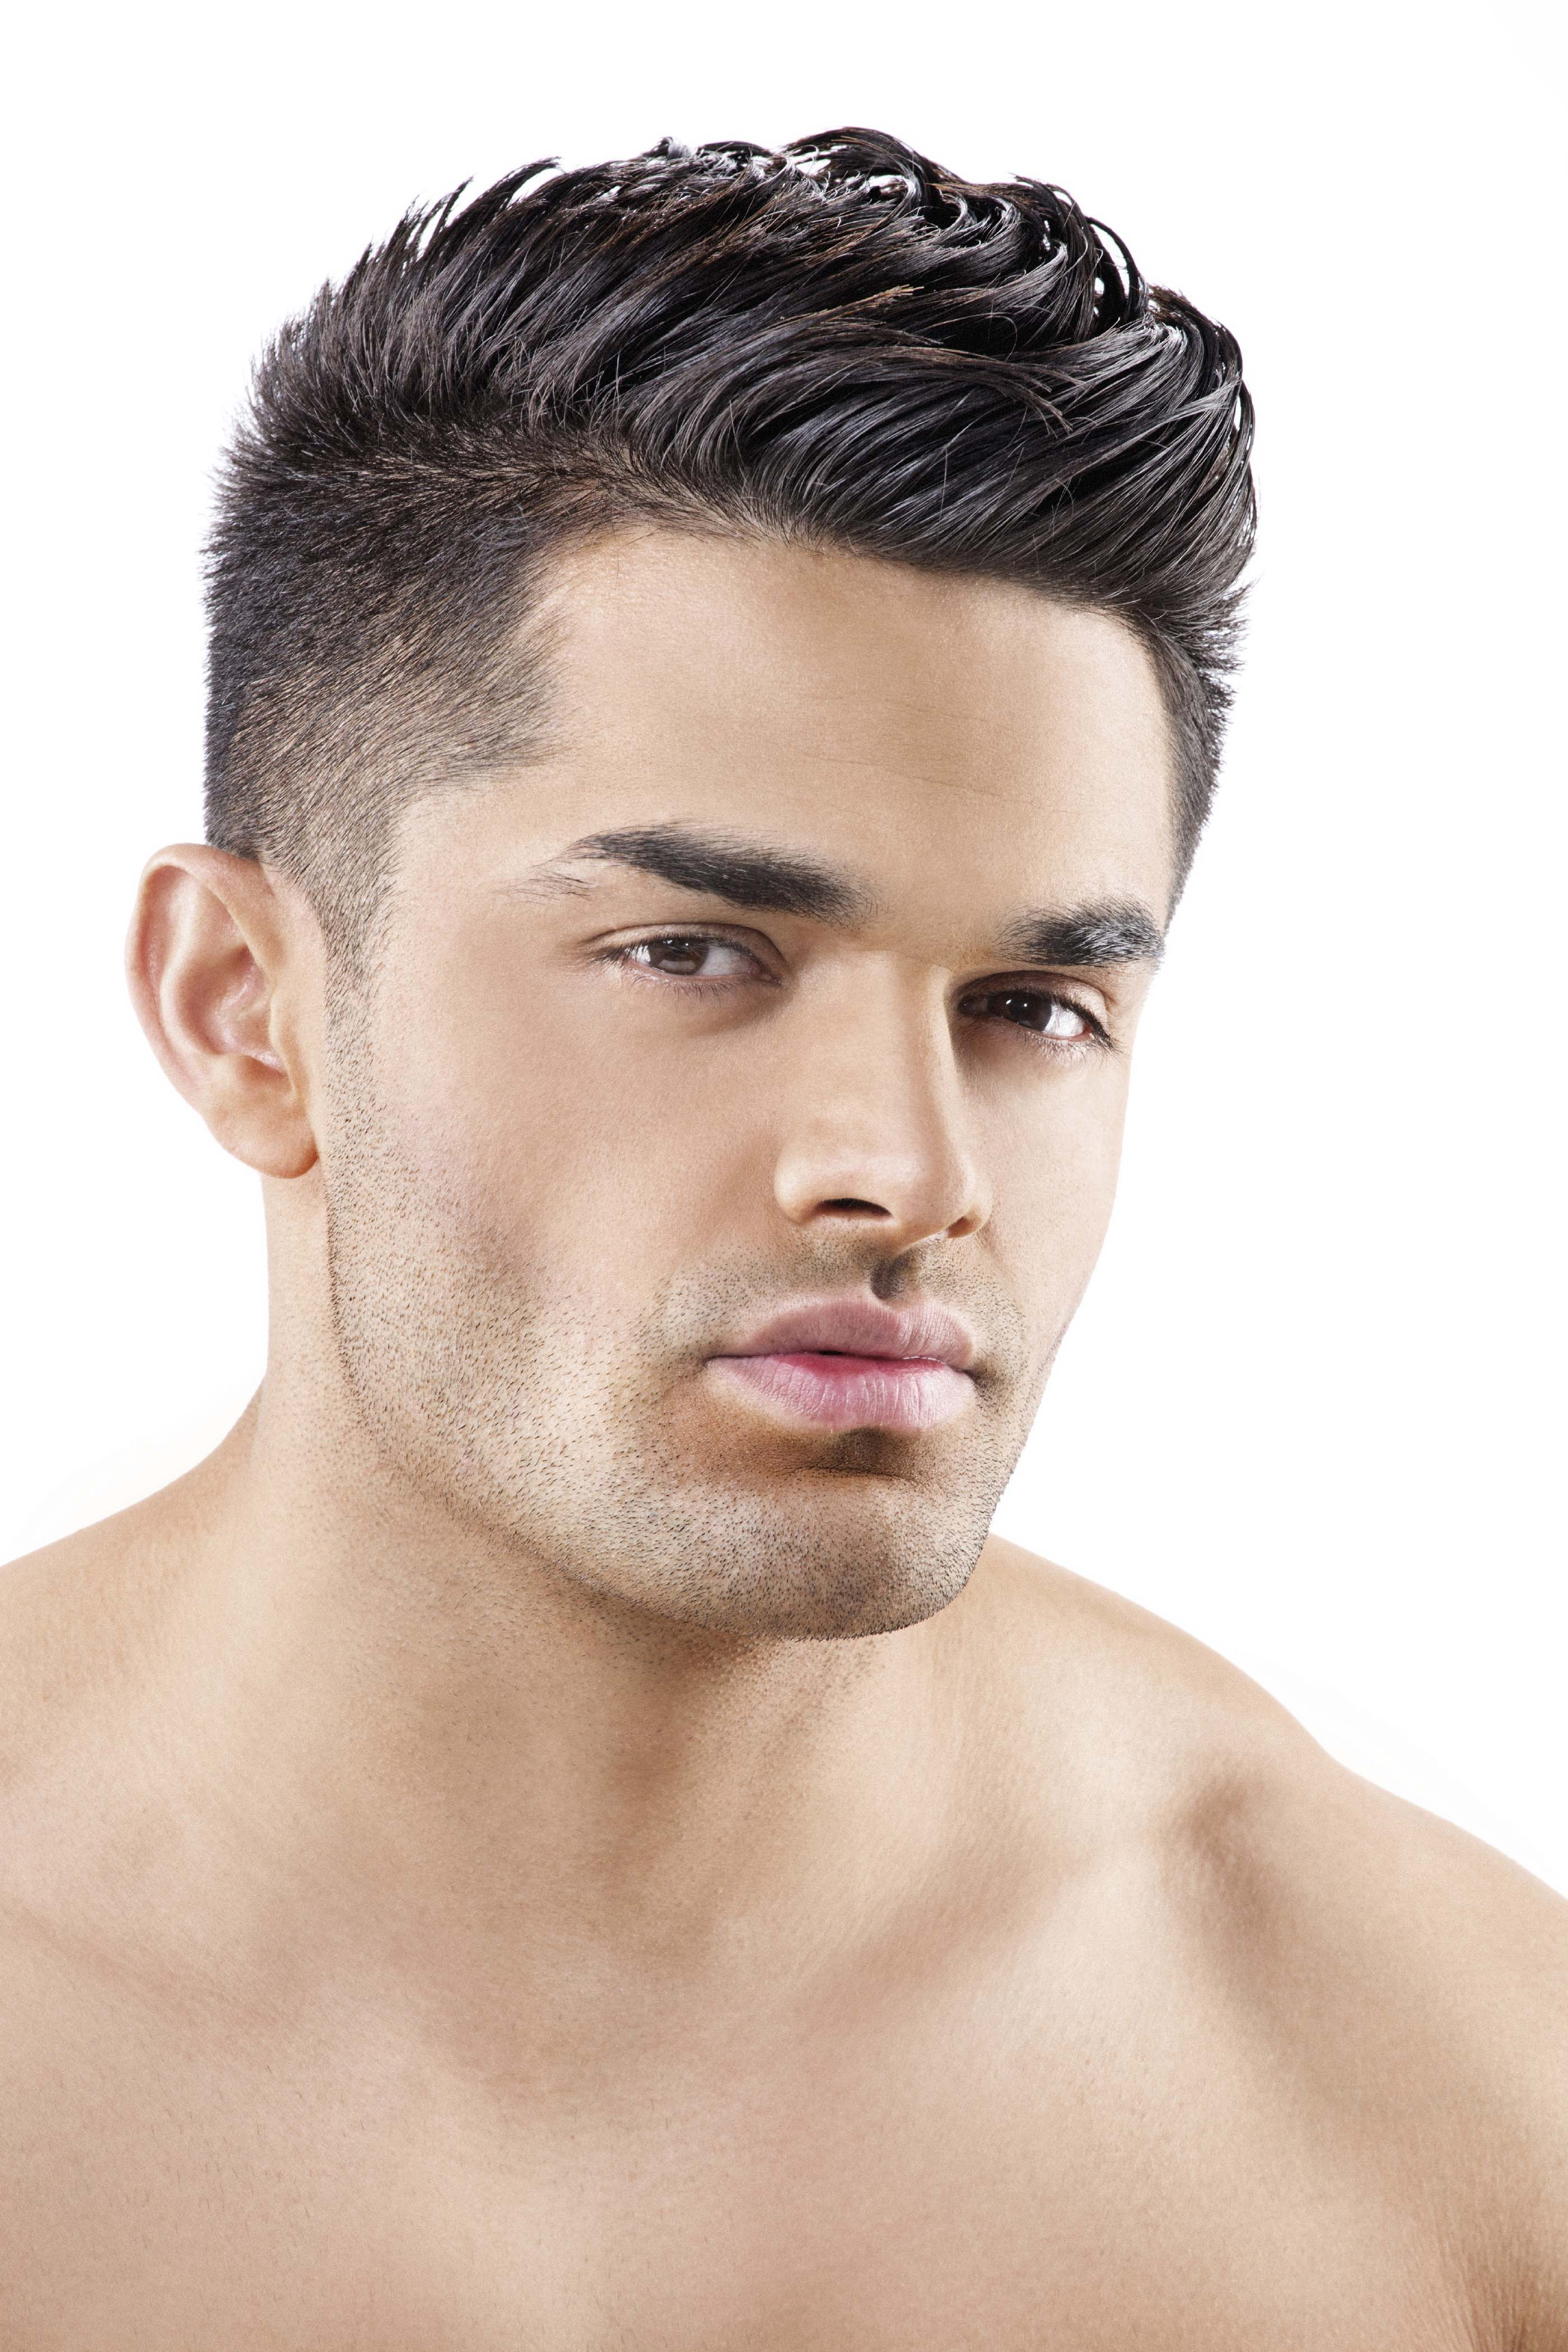 Hombre de pelo negro con corte degradado